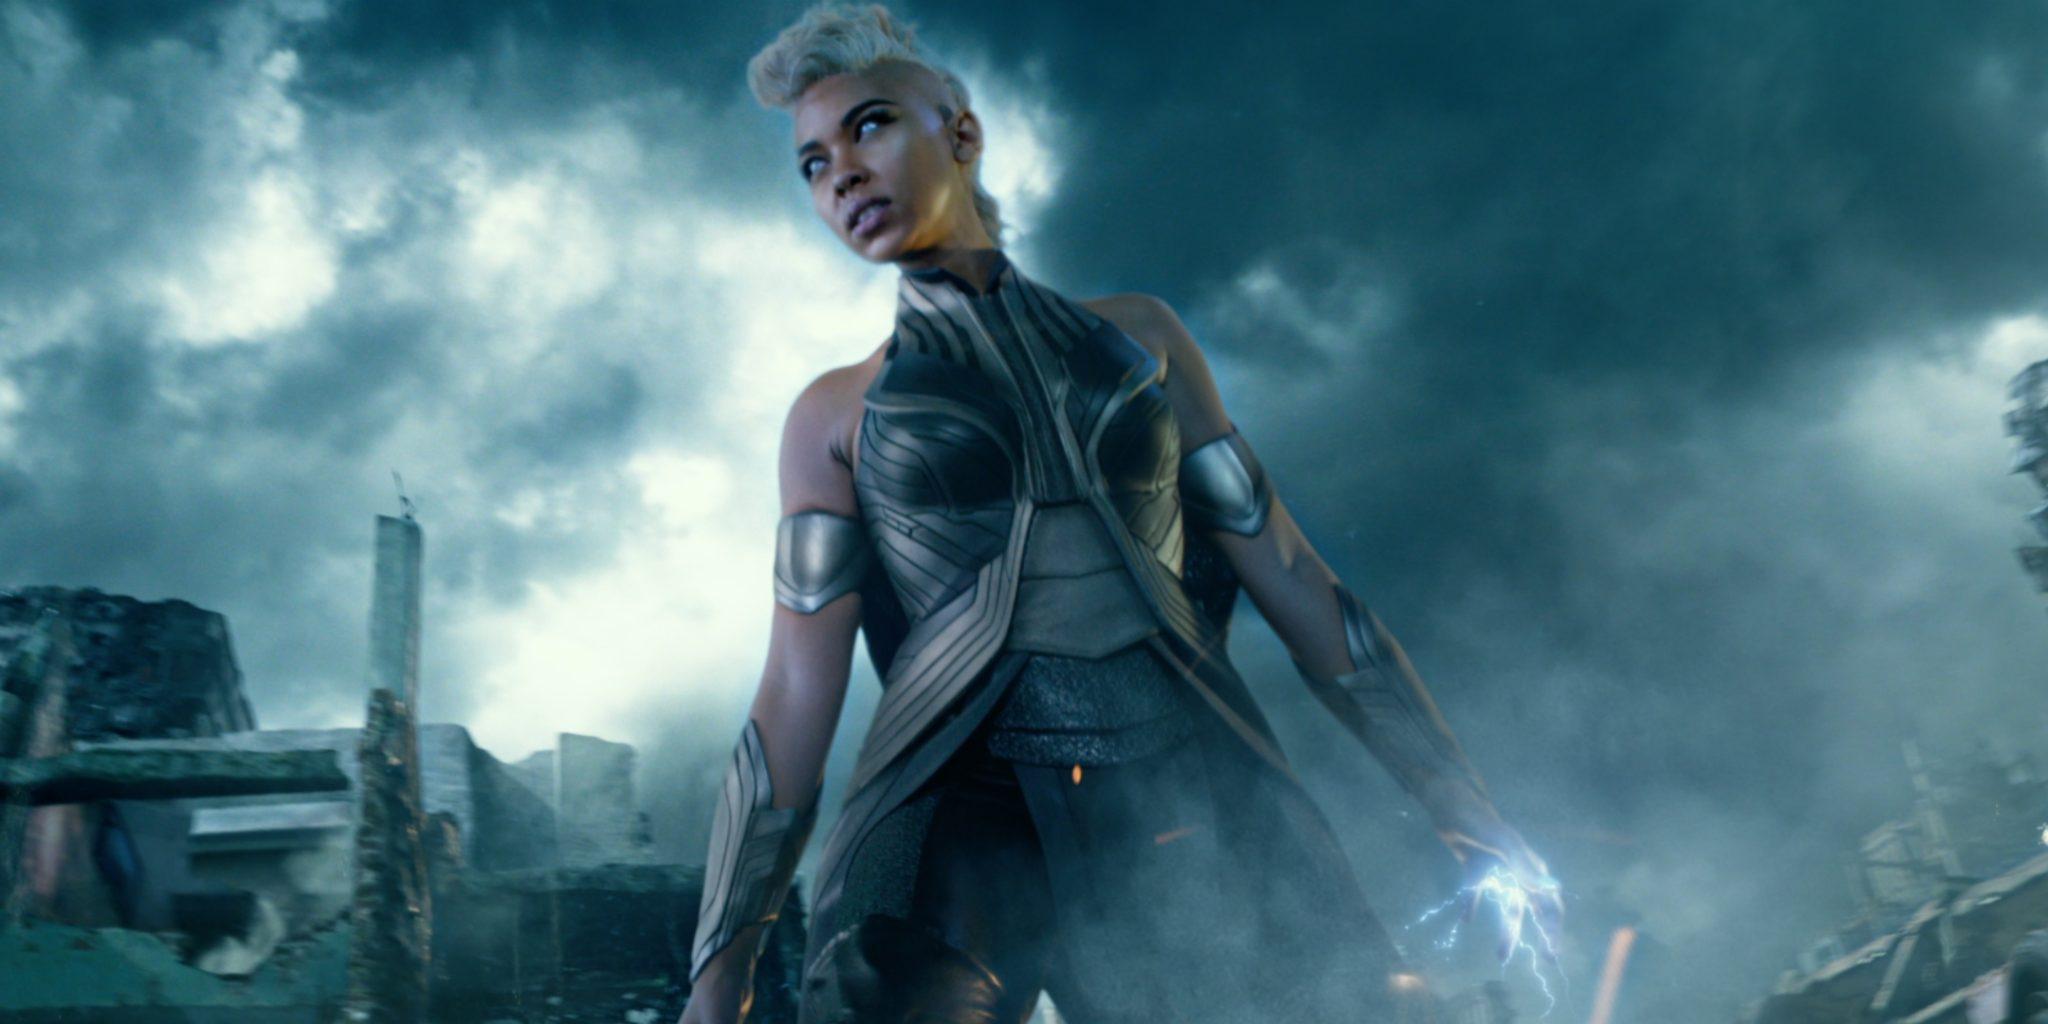 X-Men-Apocalypse-Trailer-Storm-Horseman